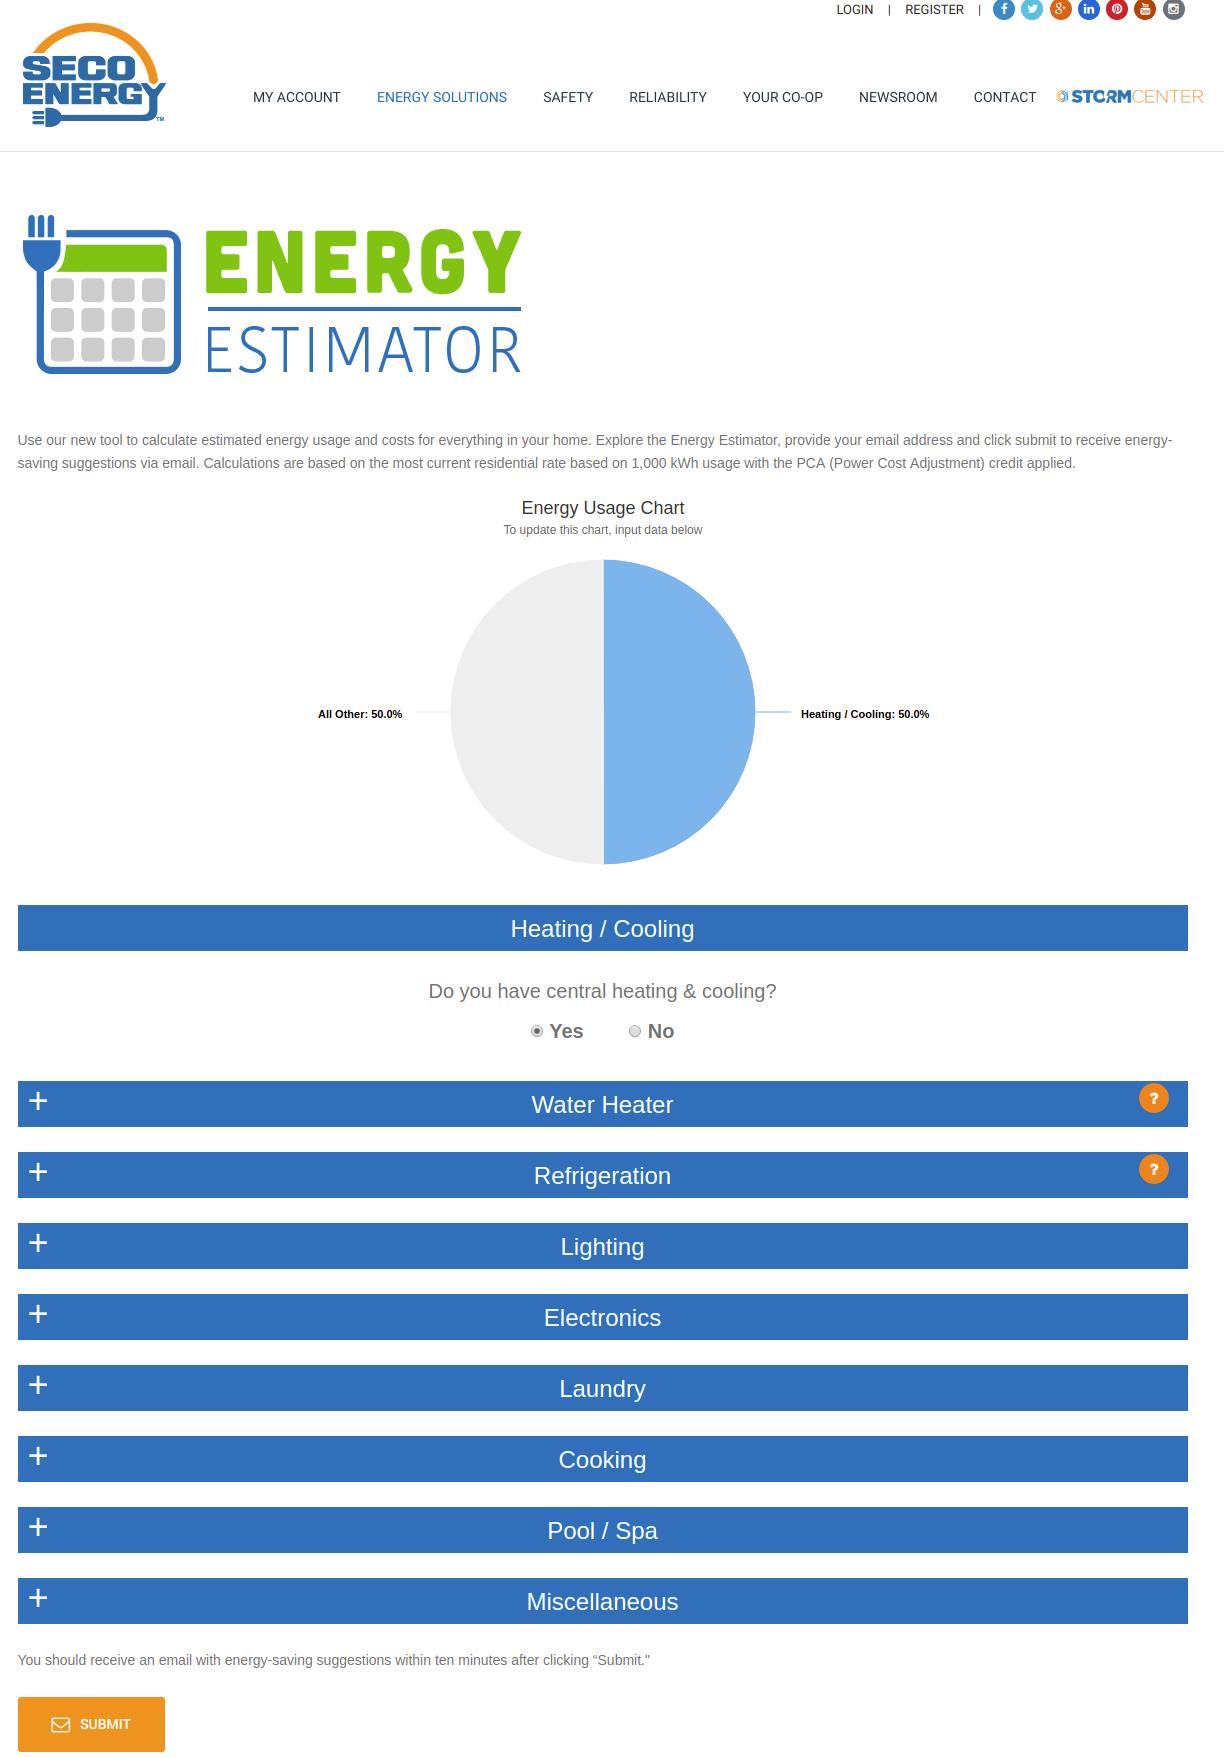 Energy Estimator – SECO Energy